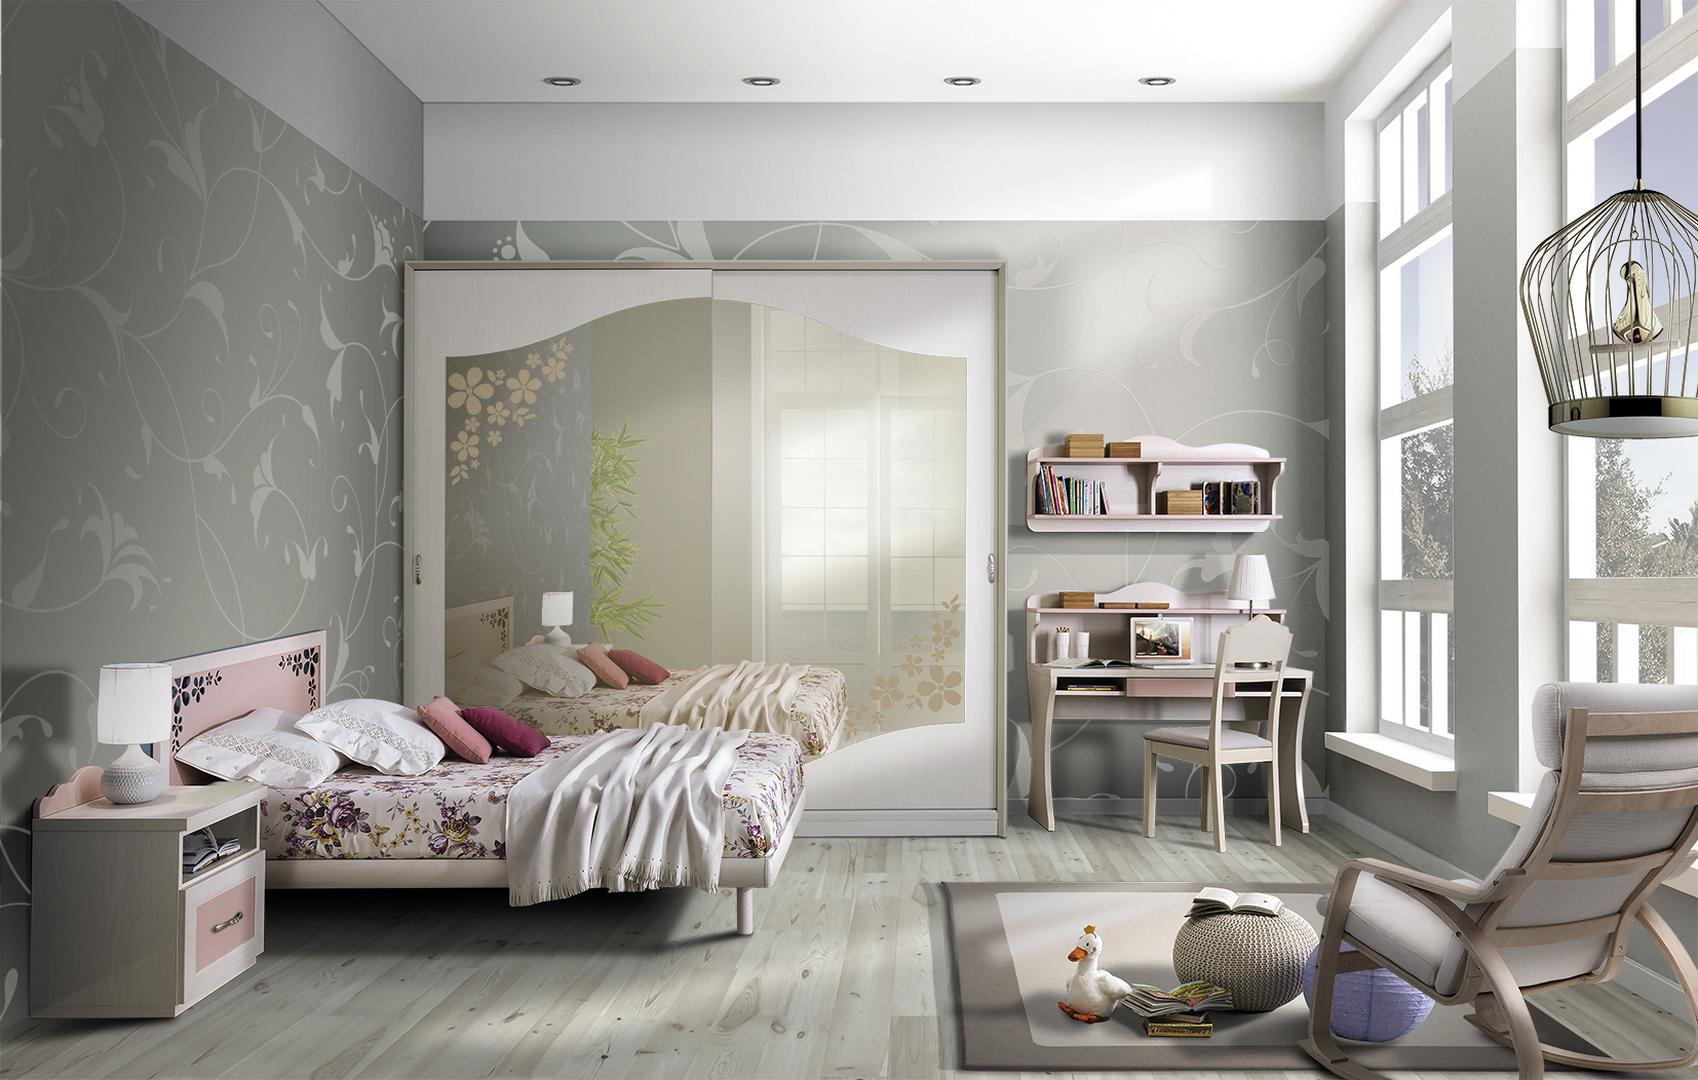 Giessegi Mobili Opinioni - Idee Per La Casa - Syafir.com